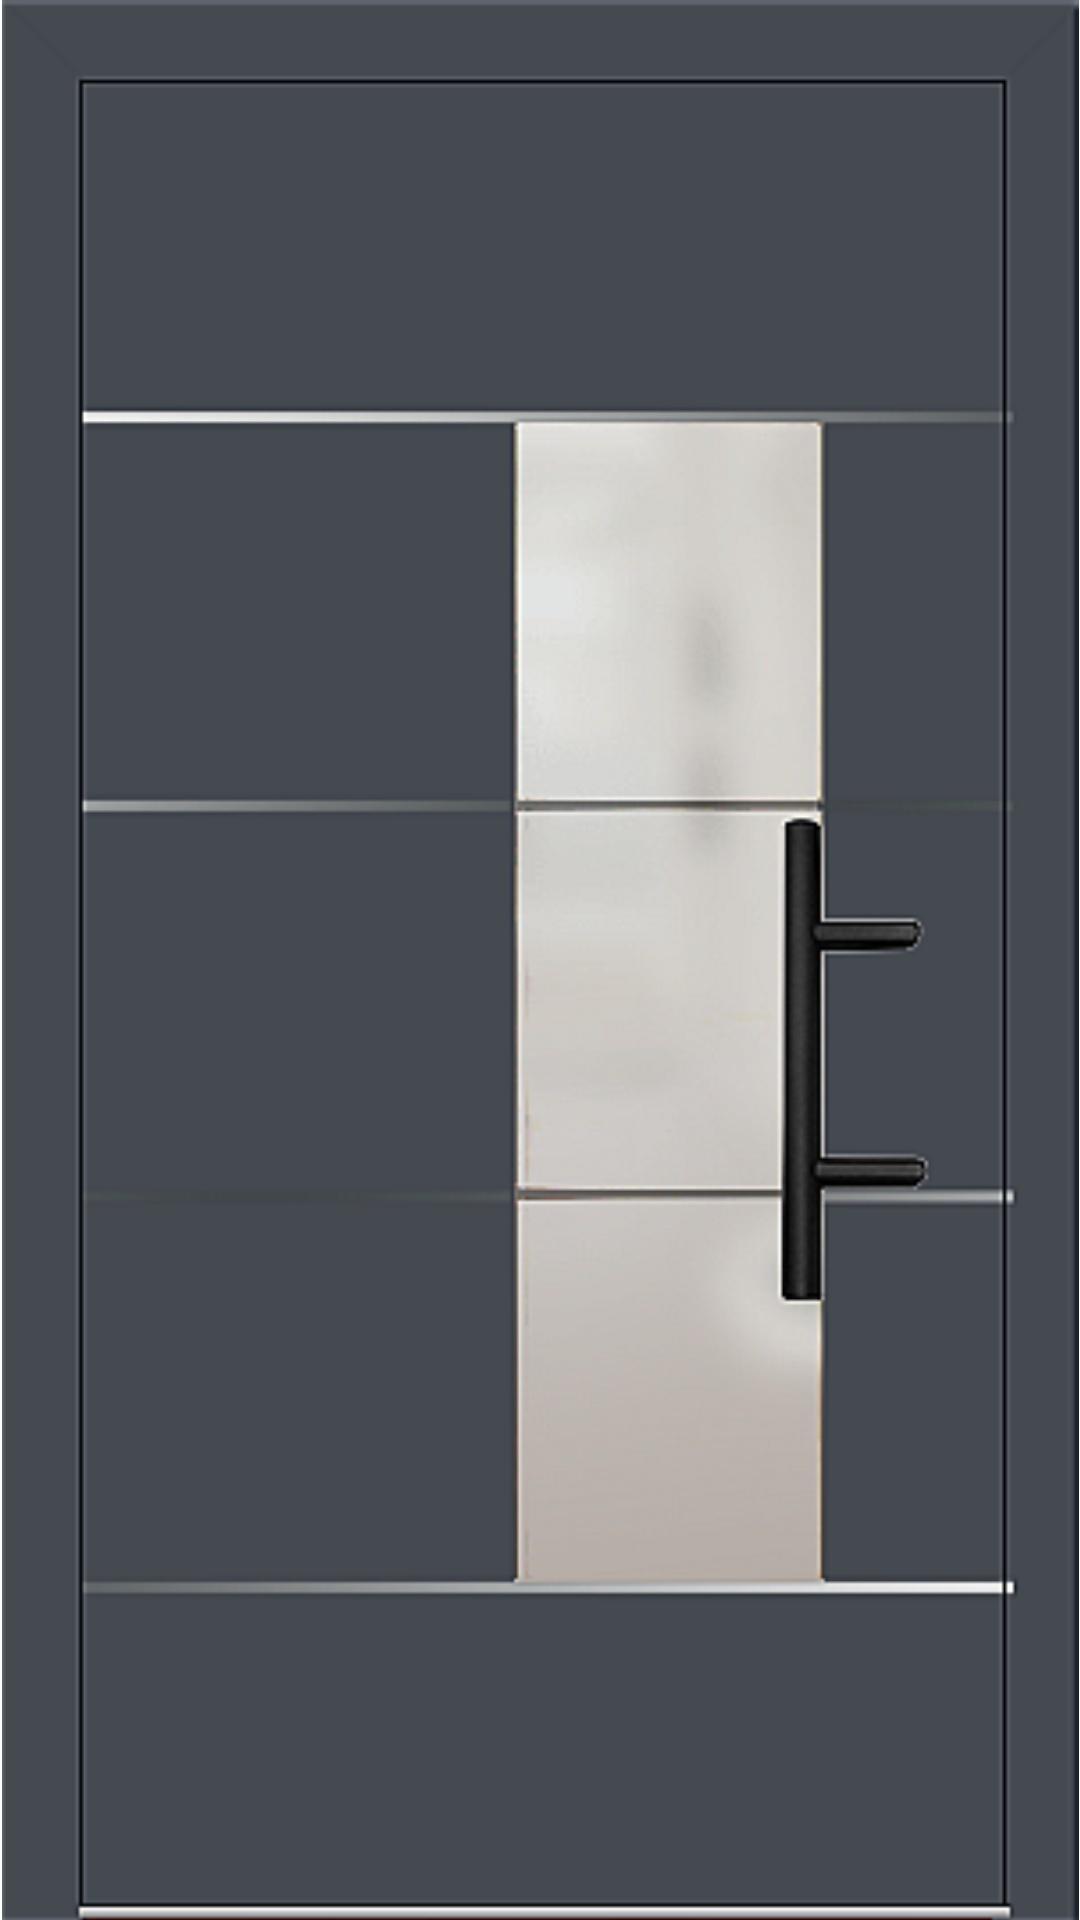 Holz-Alu Haustür Modell 66878 graphitgrau